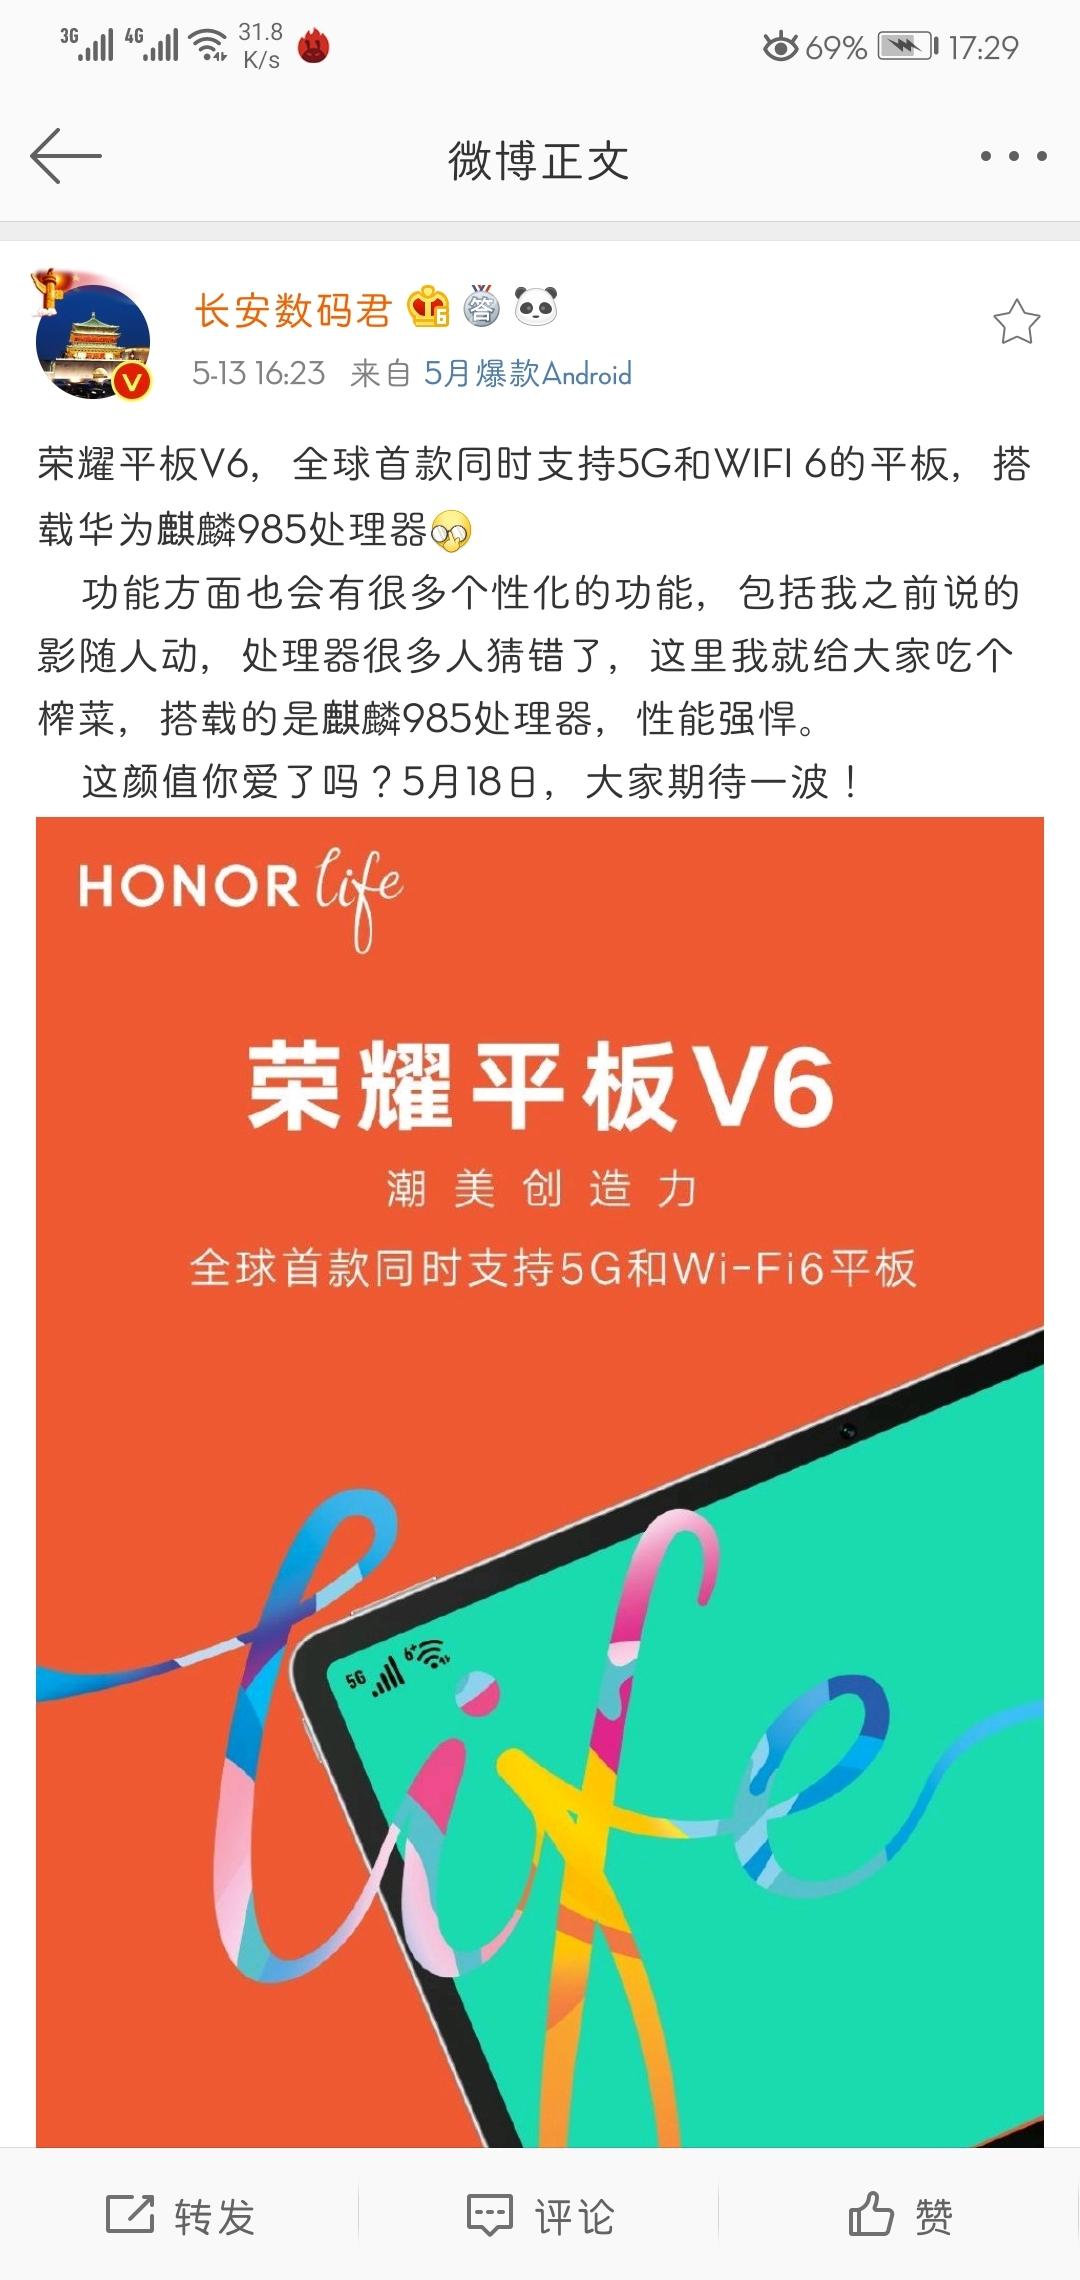 Screenshot_20200513_172943_com.sina.weibo.jpg